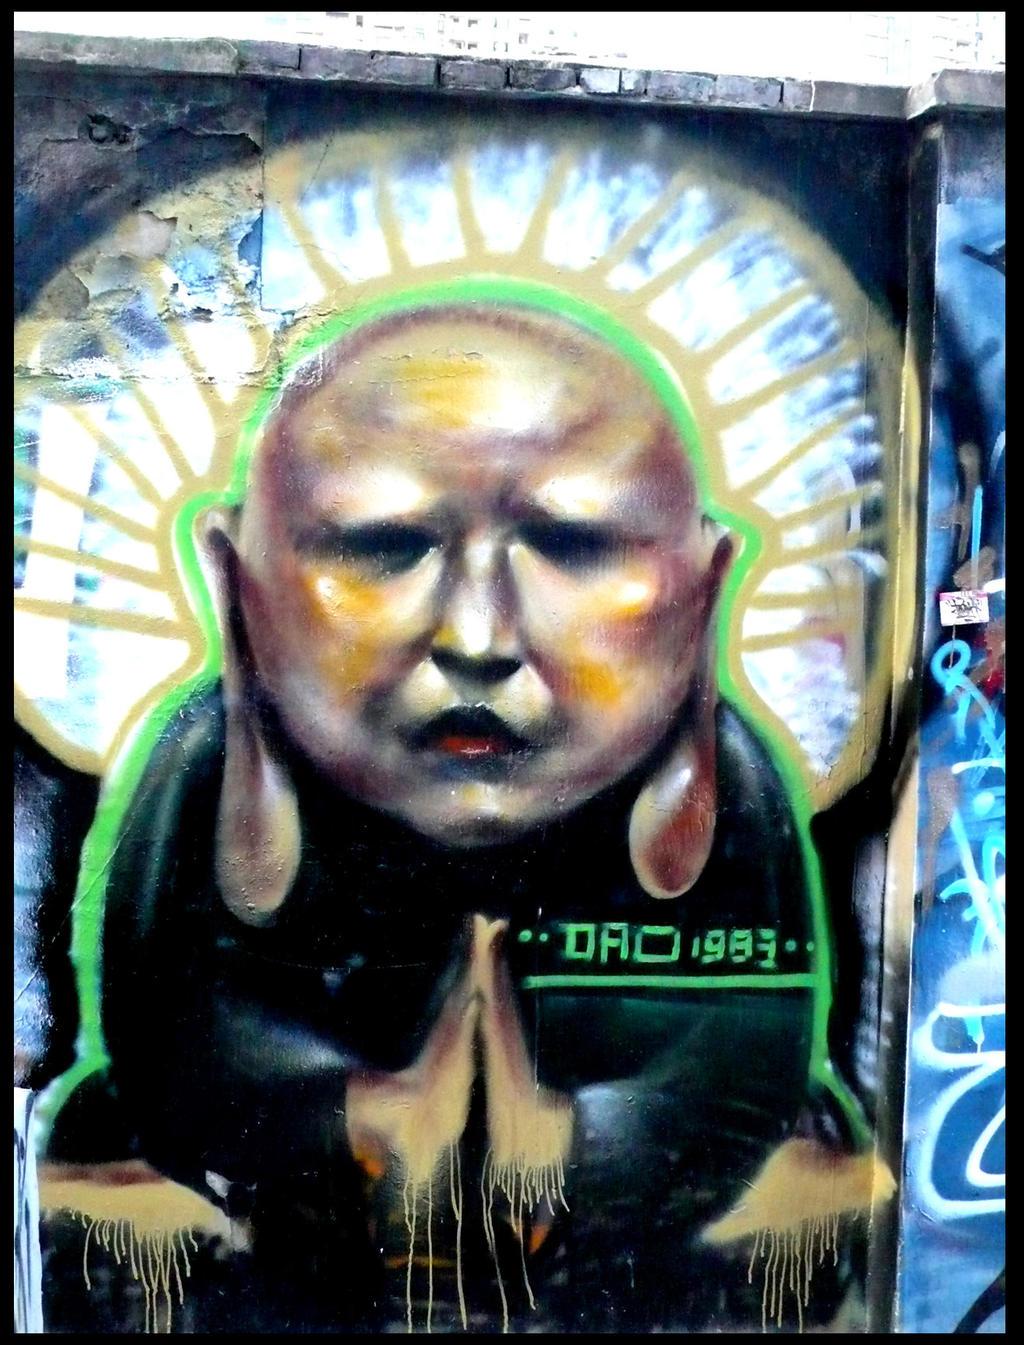 shanghai graffiti 168 buddha by sylences on deviantart